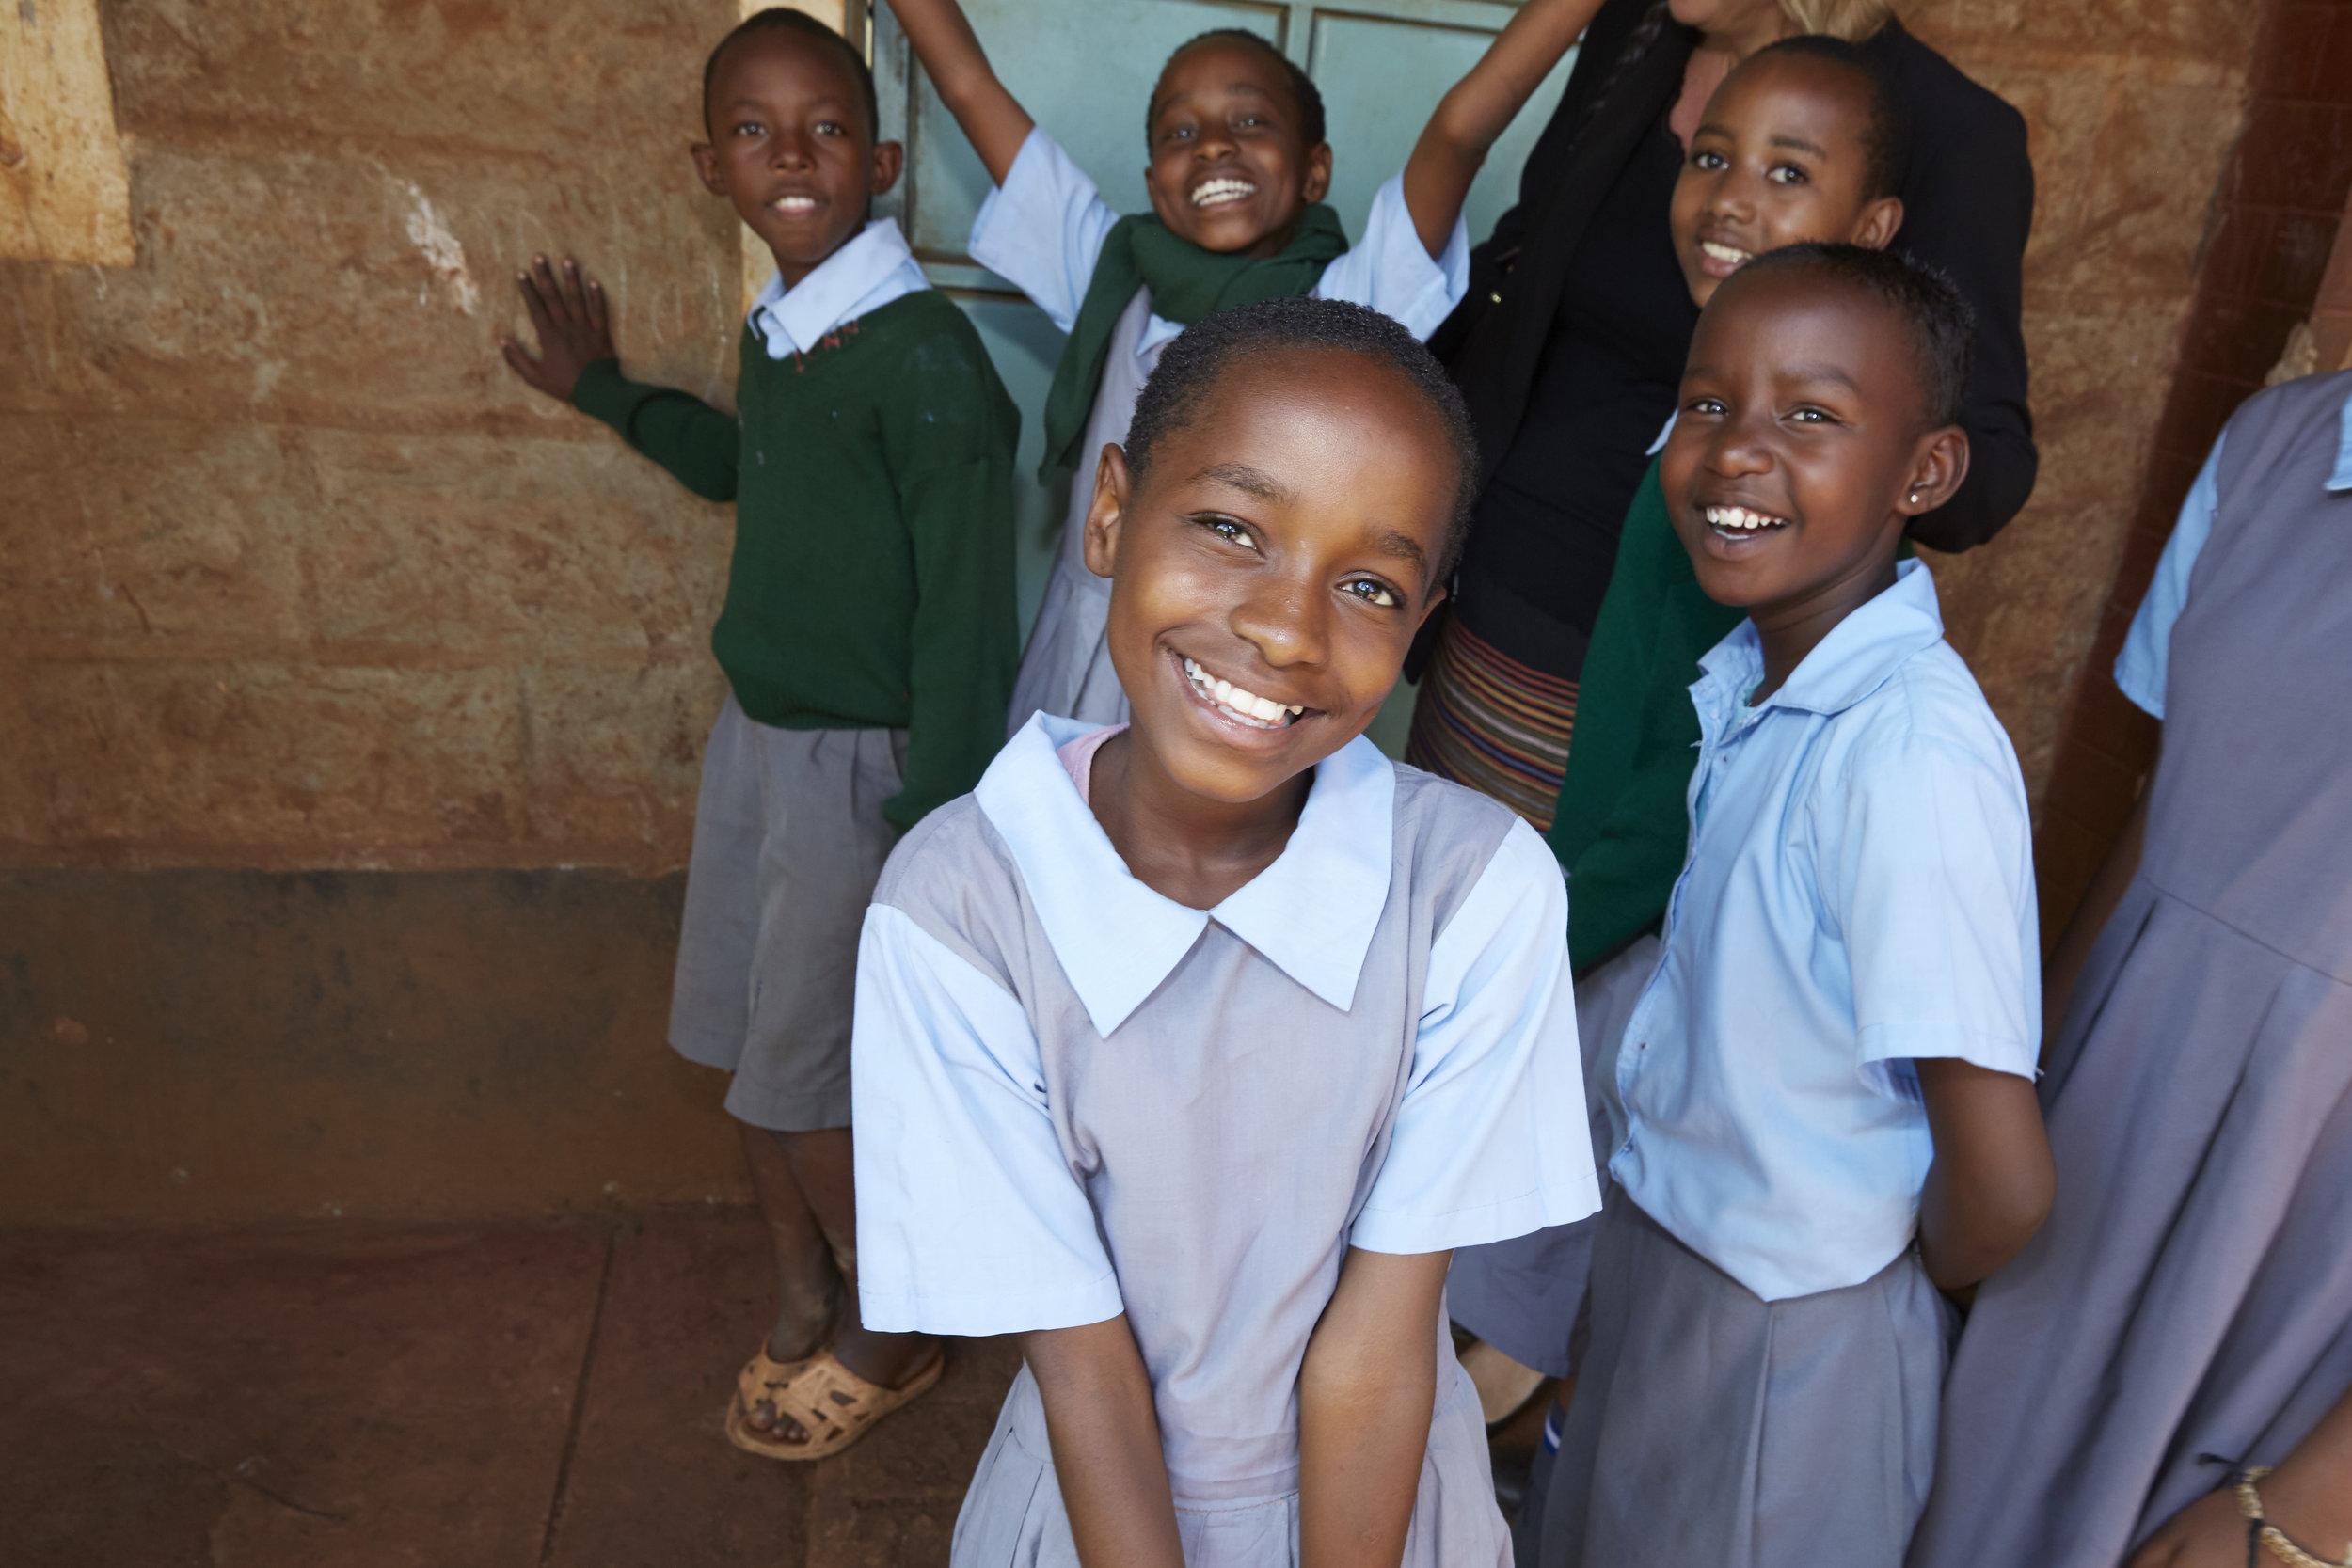 Kenya_NGURUBANI_JW_WDF_0427_23B8855.jpg